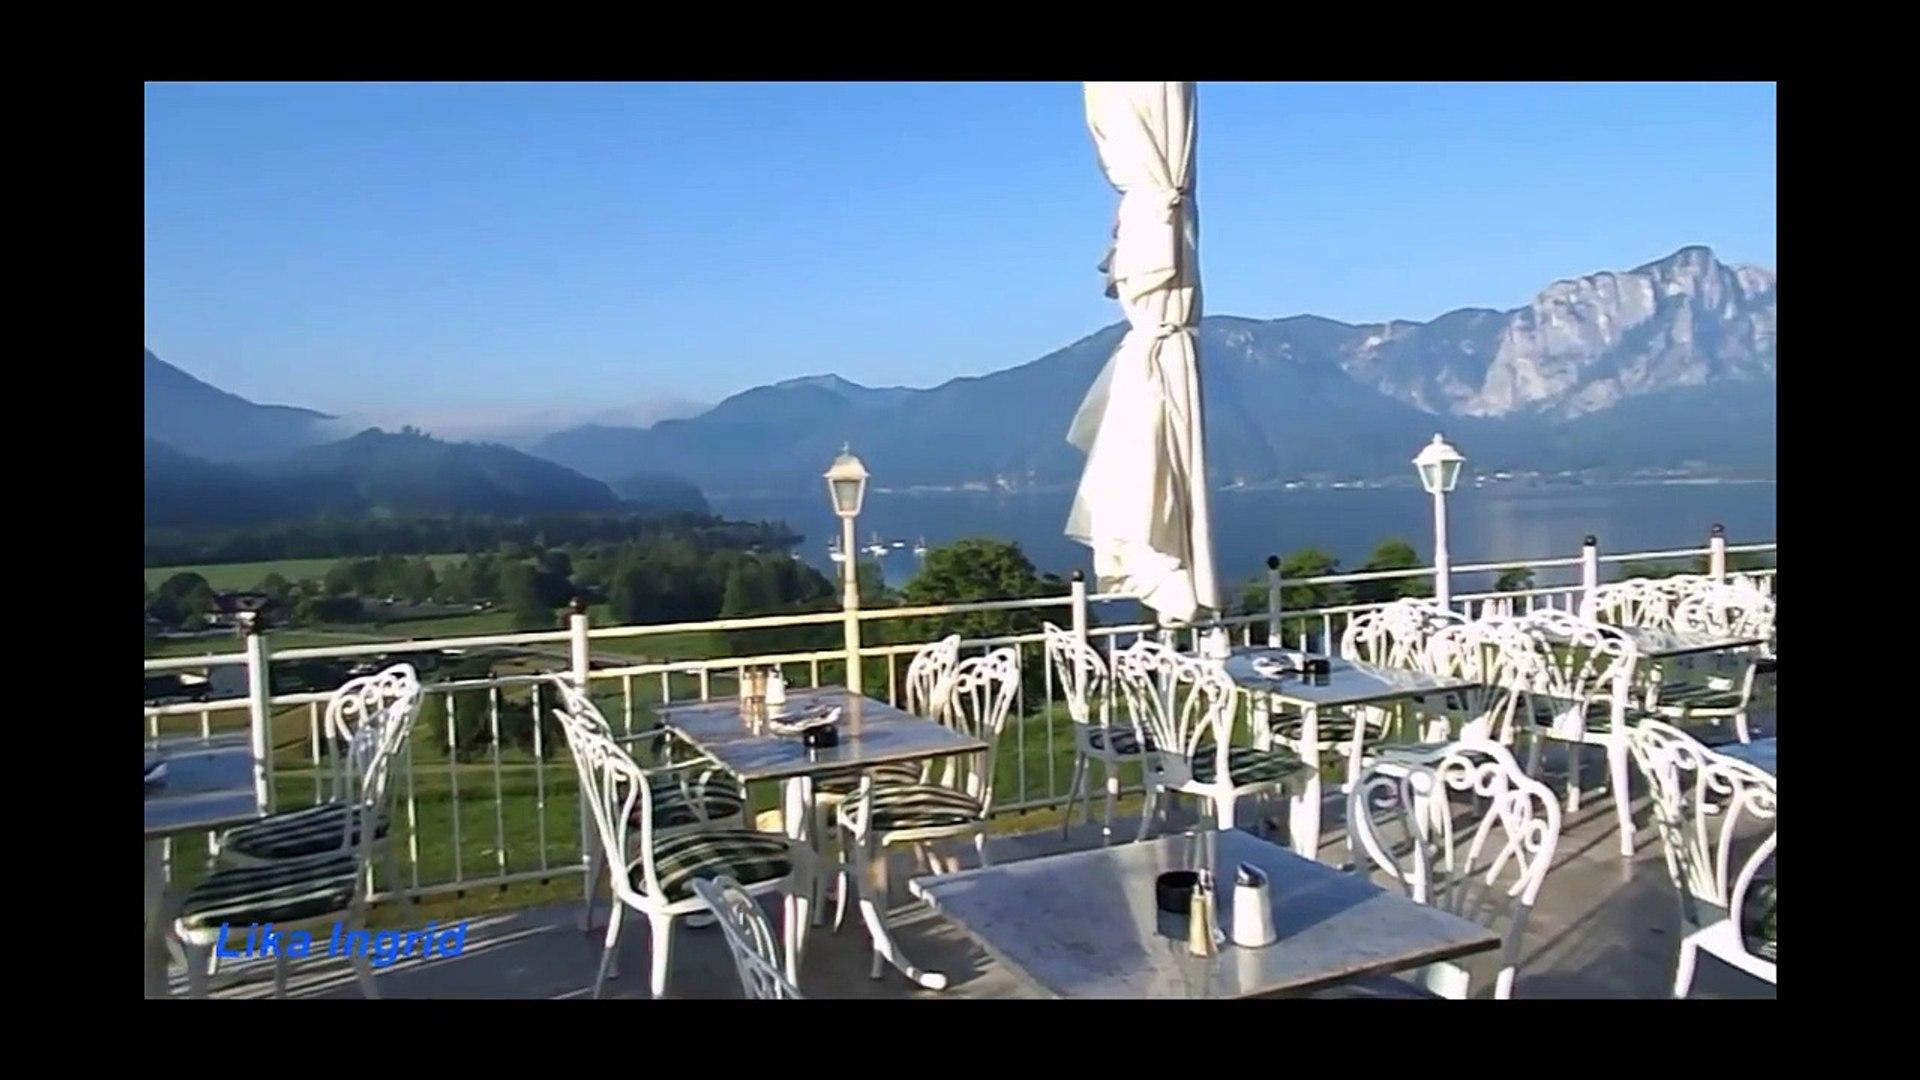 Austria Mondsee (Lake)